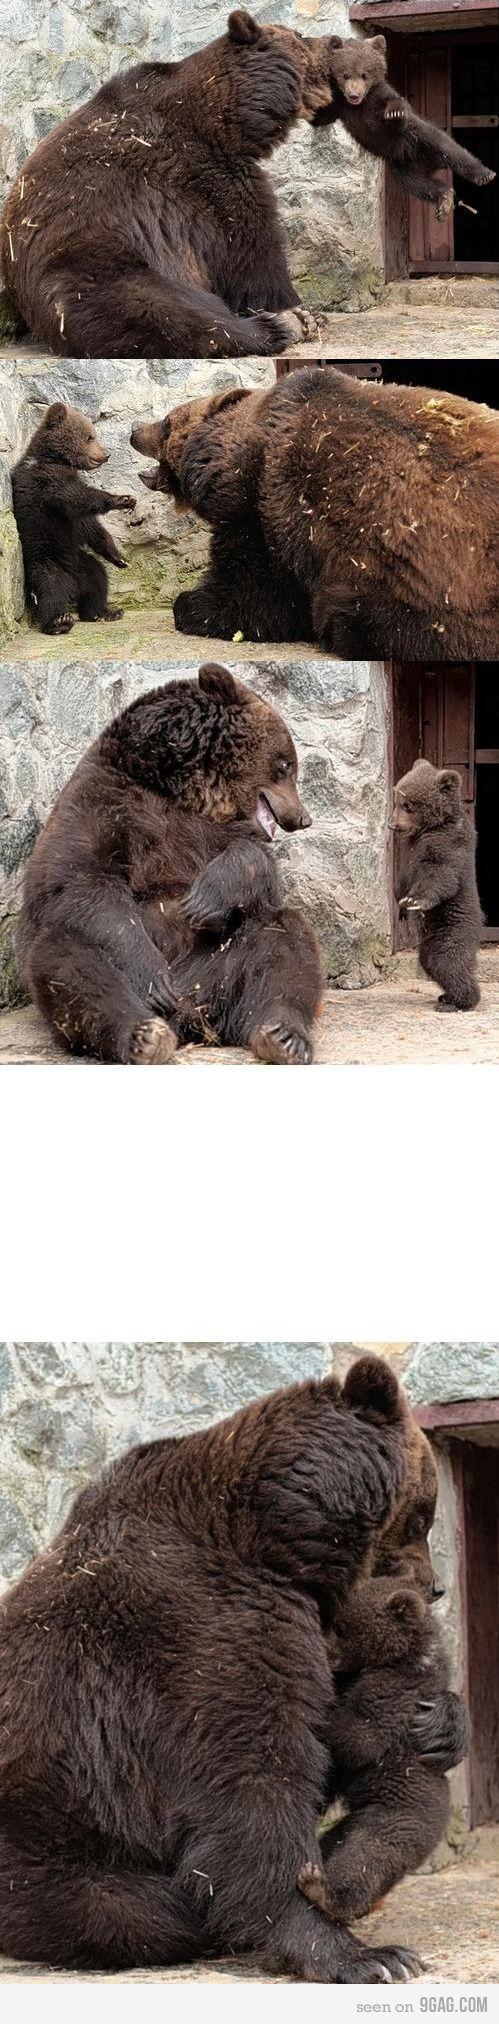 parenting, bear style